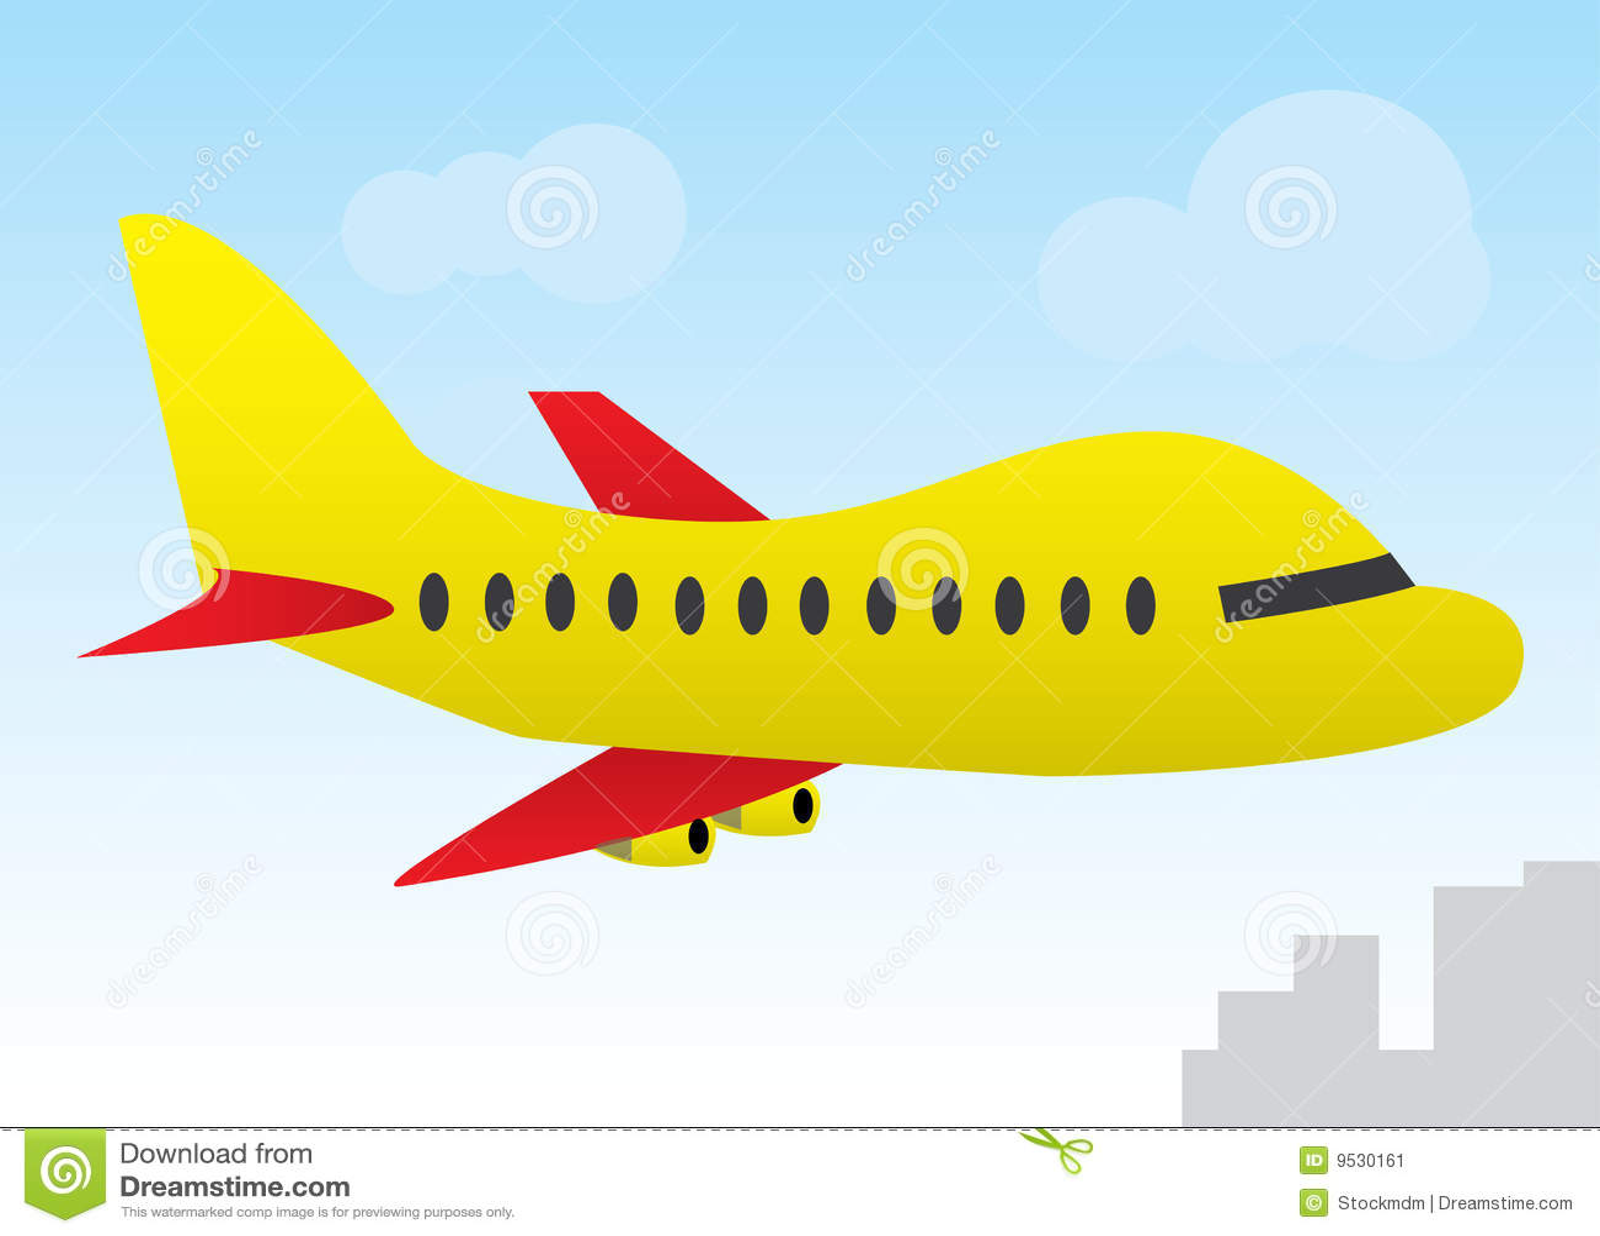 Avion de dessin anim image stock image 9530161 - Avion en dessin ...